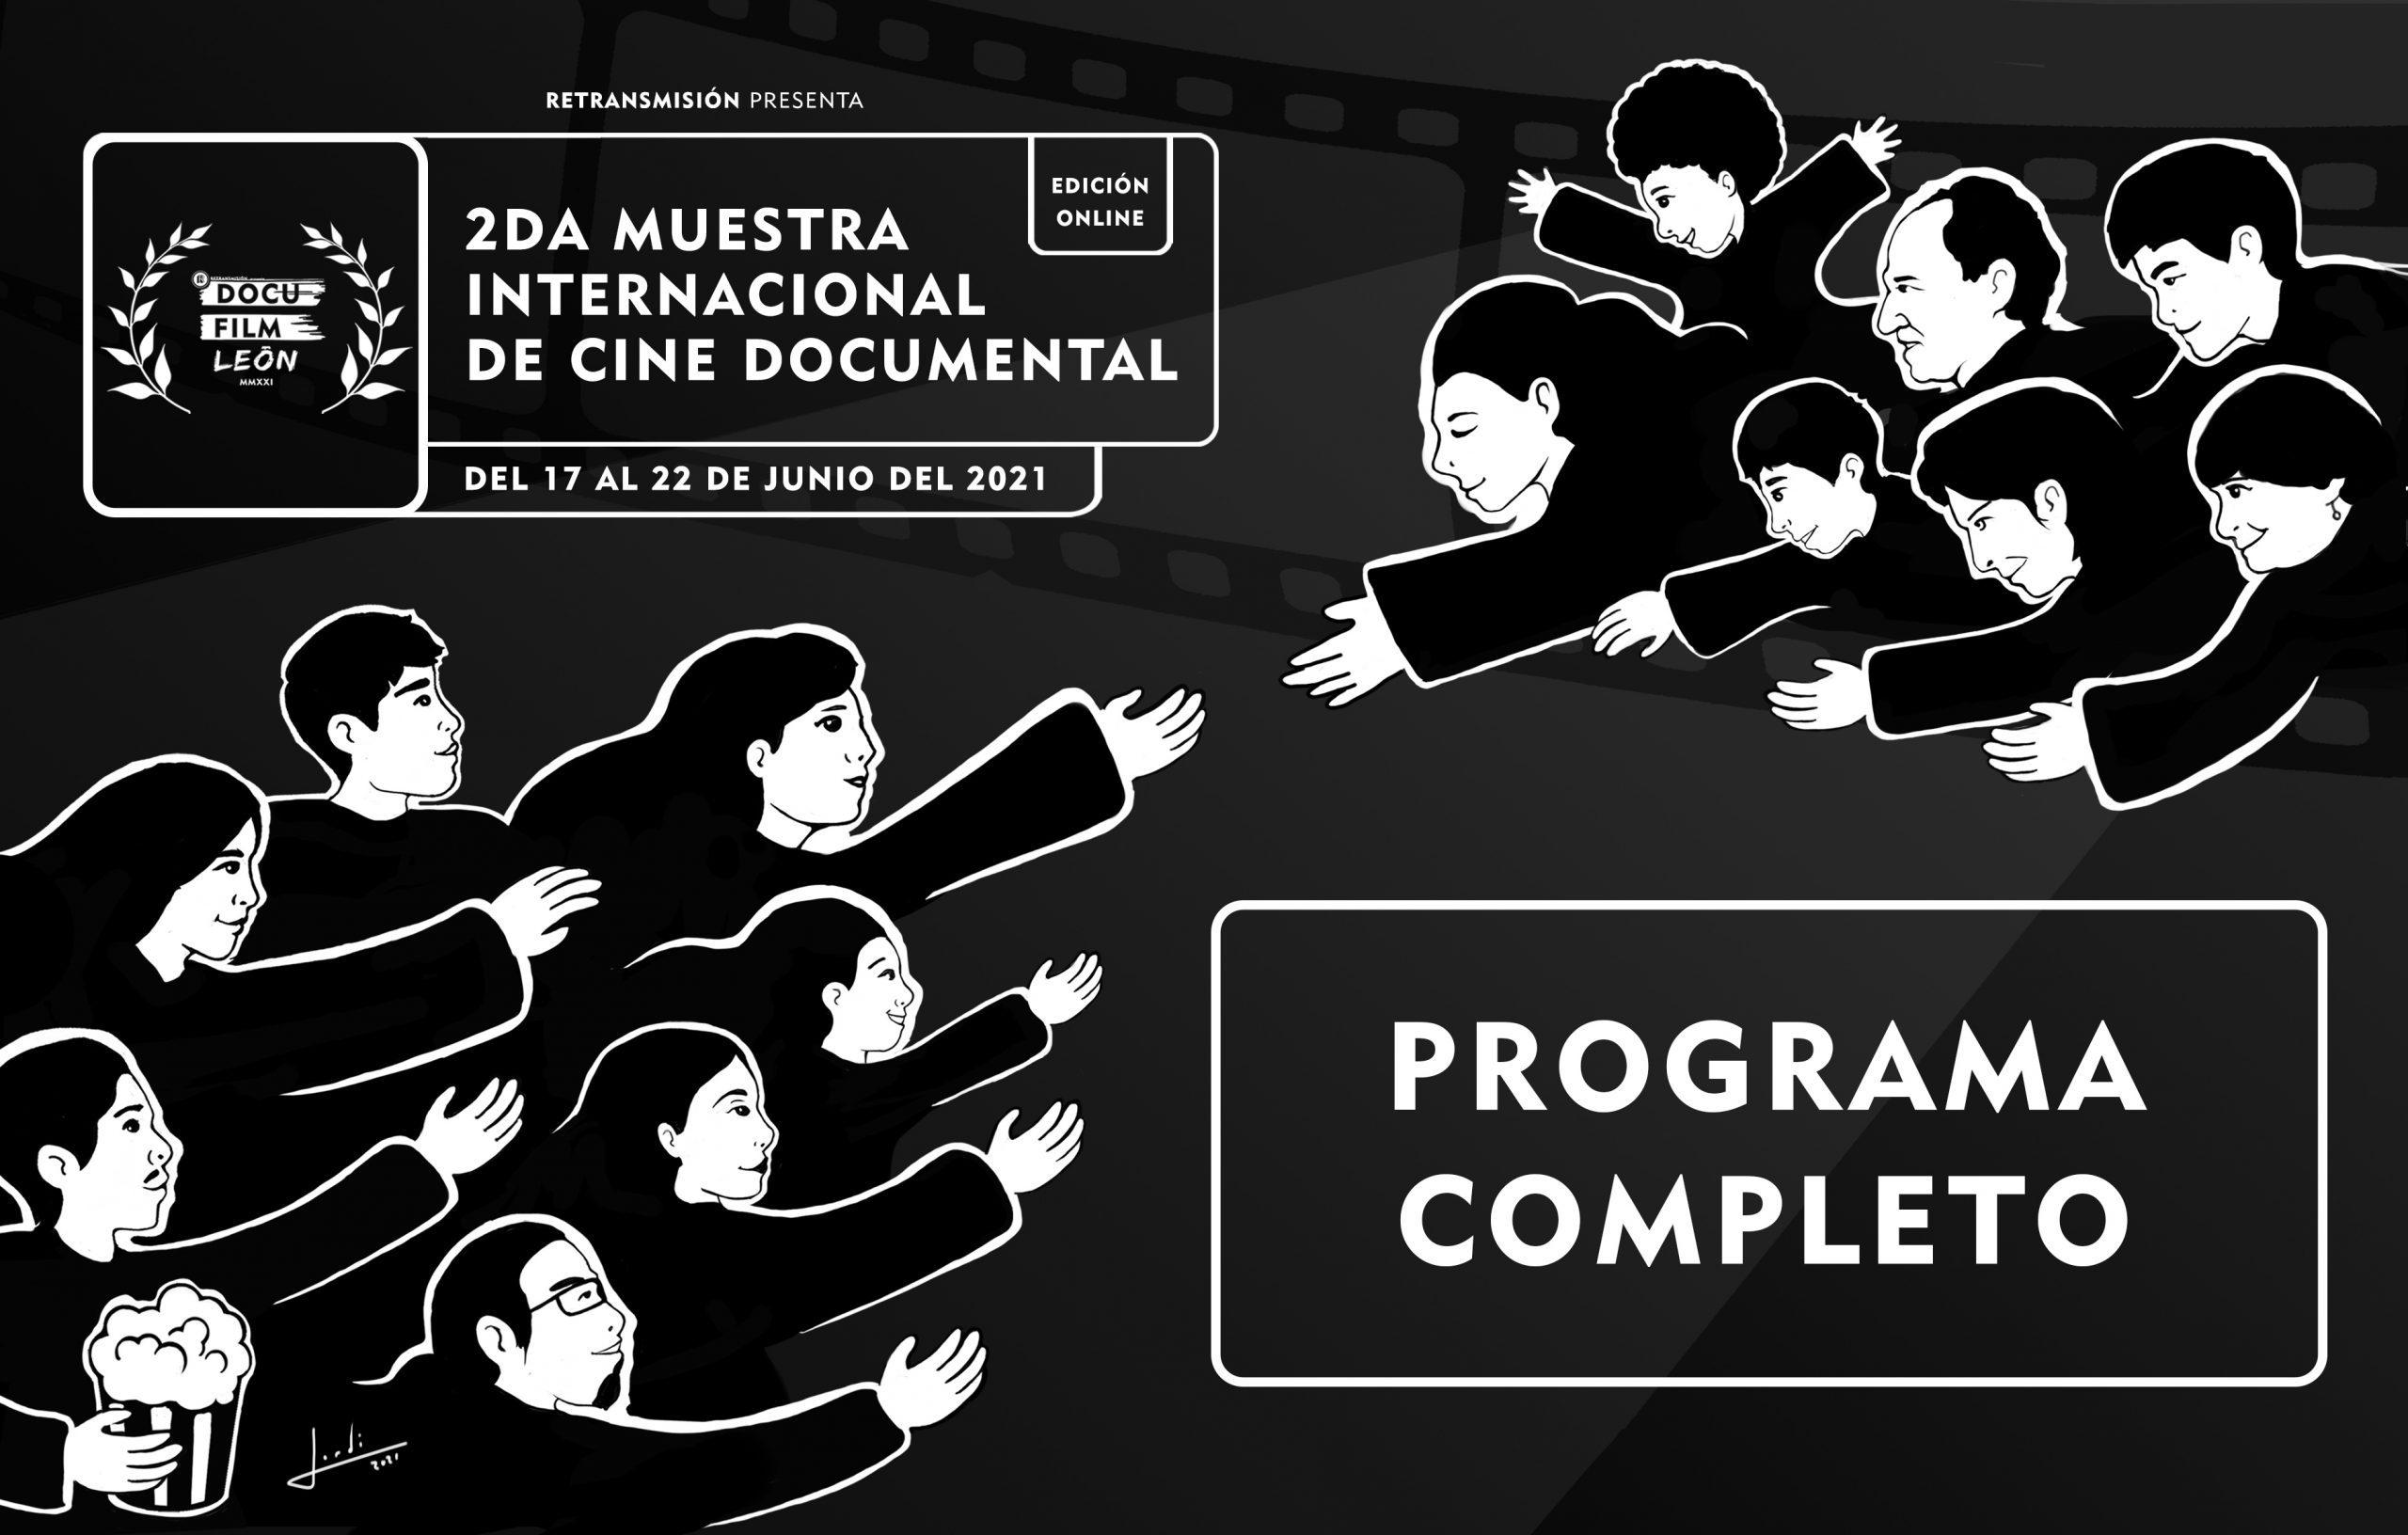 PROGRAMA-COMPLETO-2021-DOCU-FILM-LEÓN-RETRANSMISIÓN